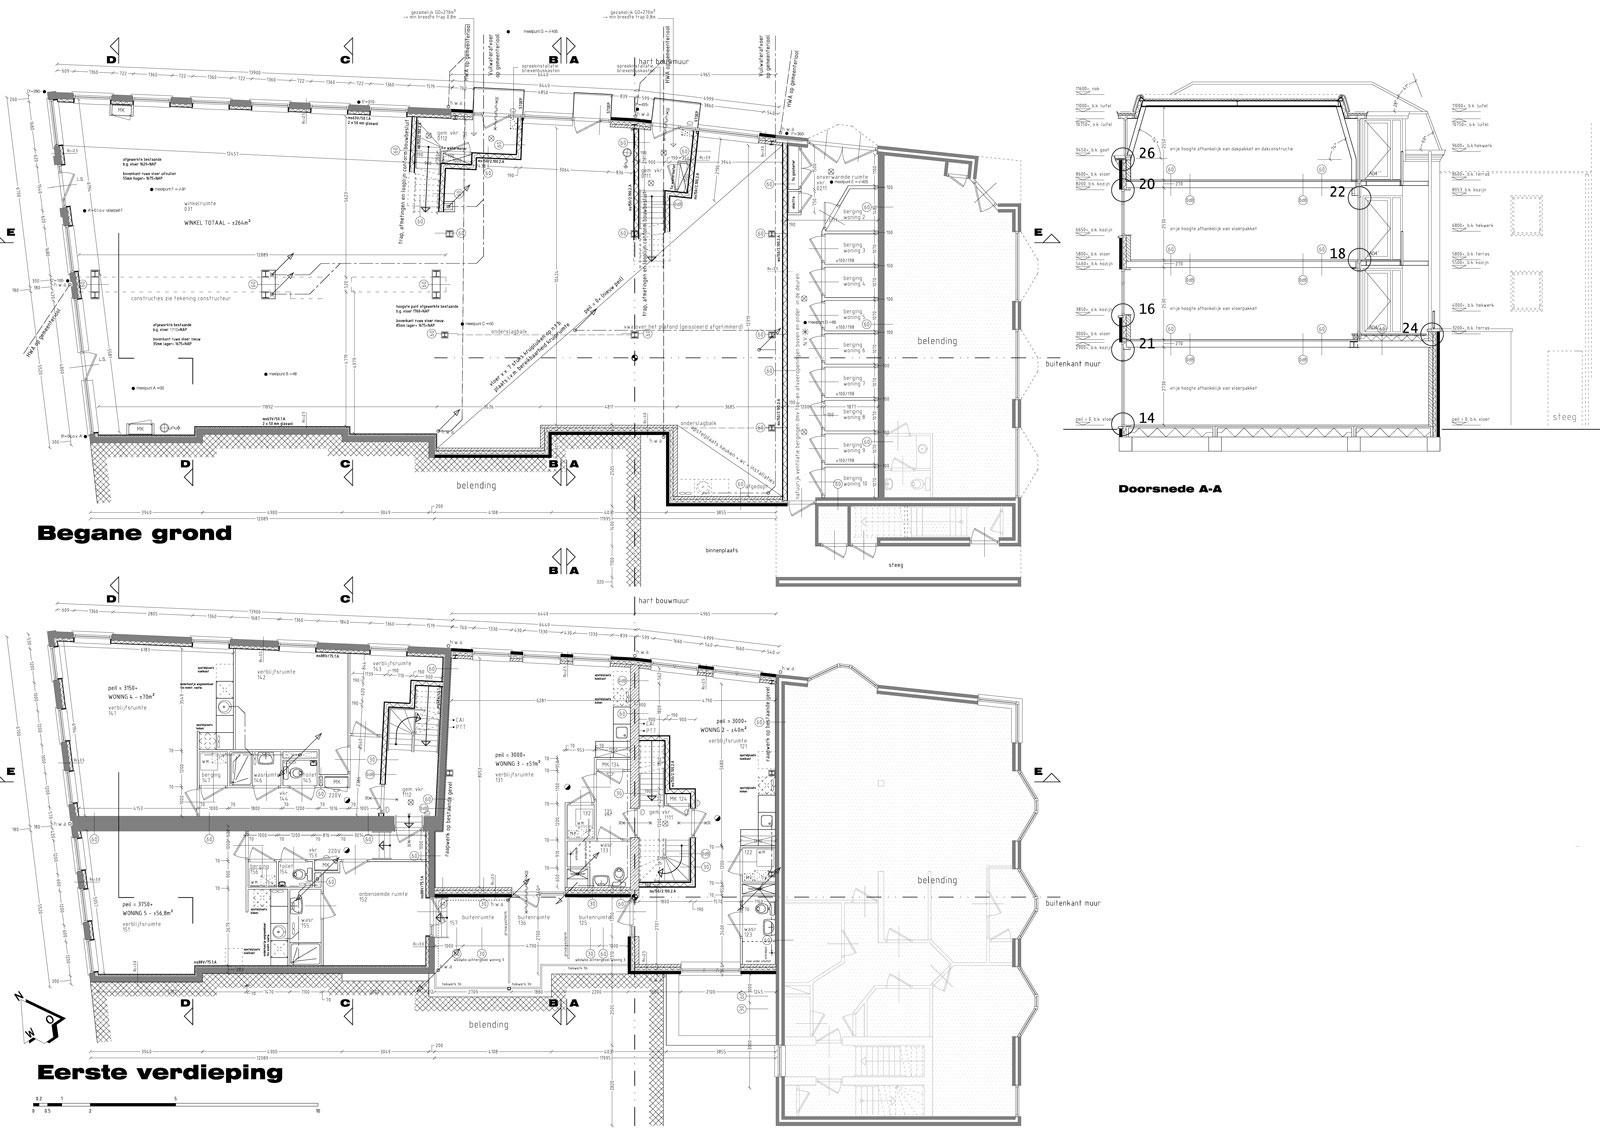 bouwtekening begane grond en eerste verdieping - wonen boven winkels Peperstraat Purmerend